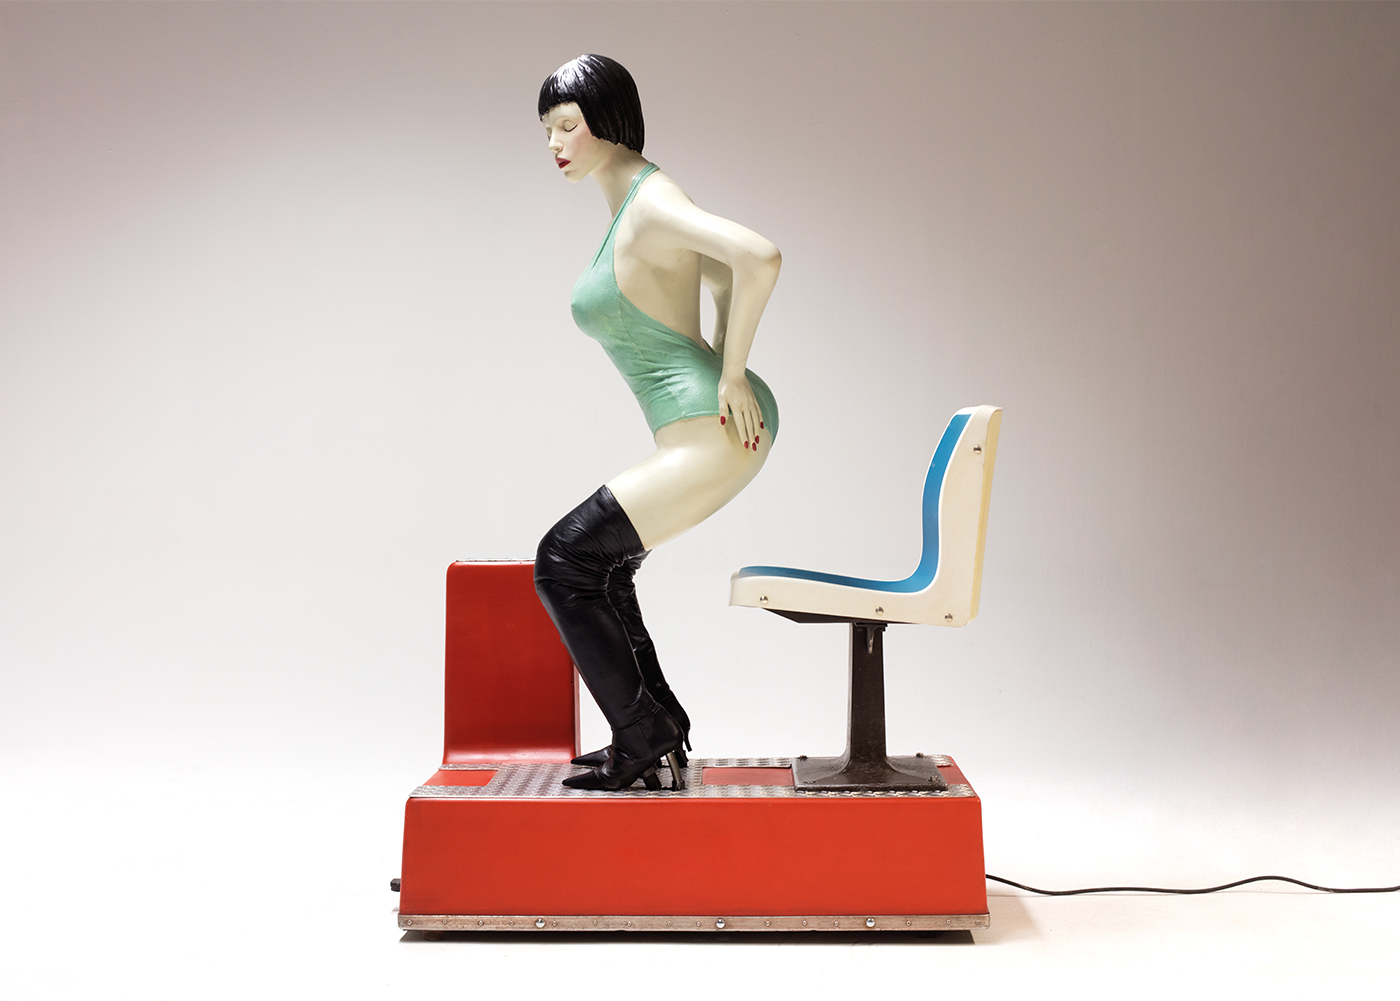 lapdance ride